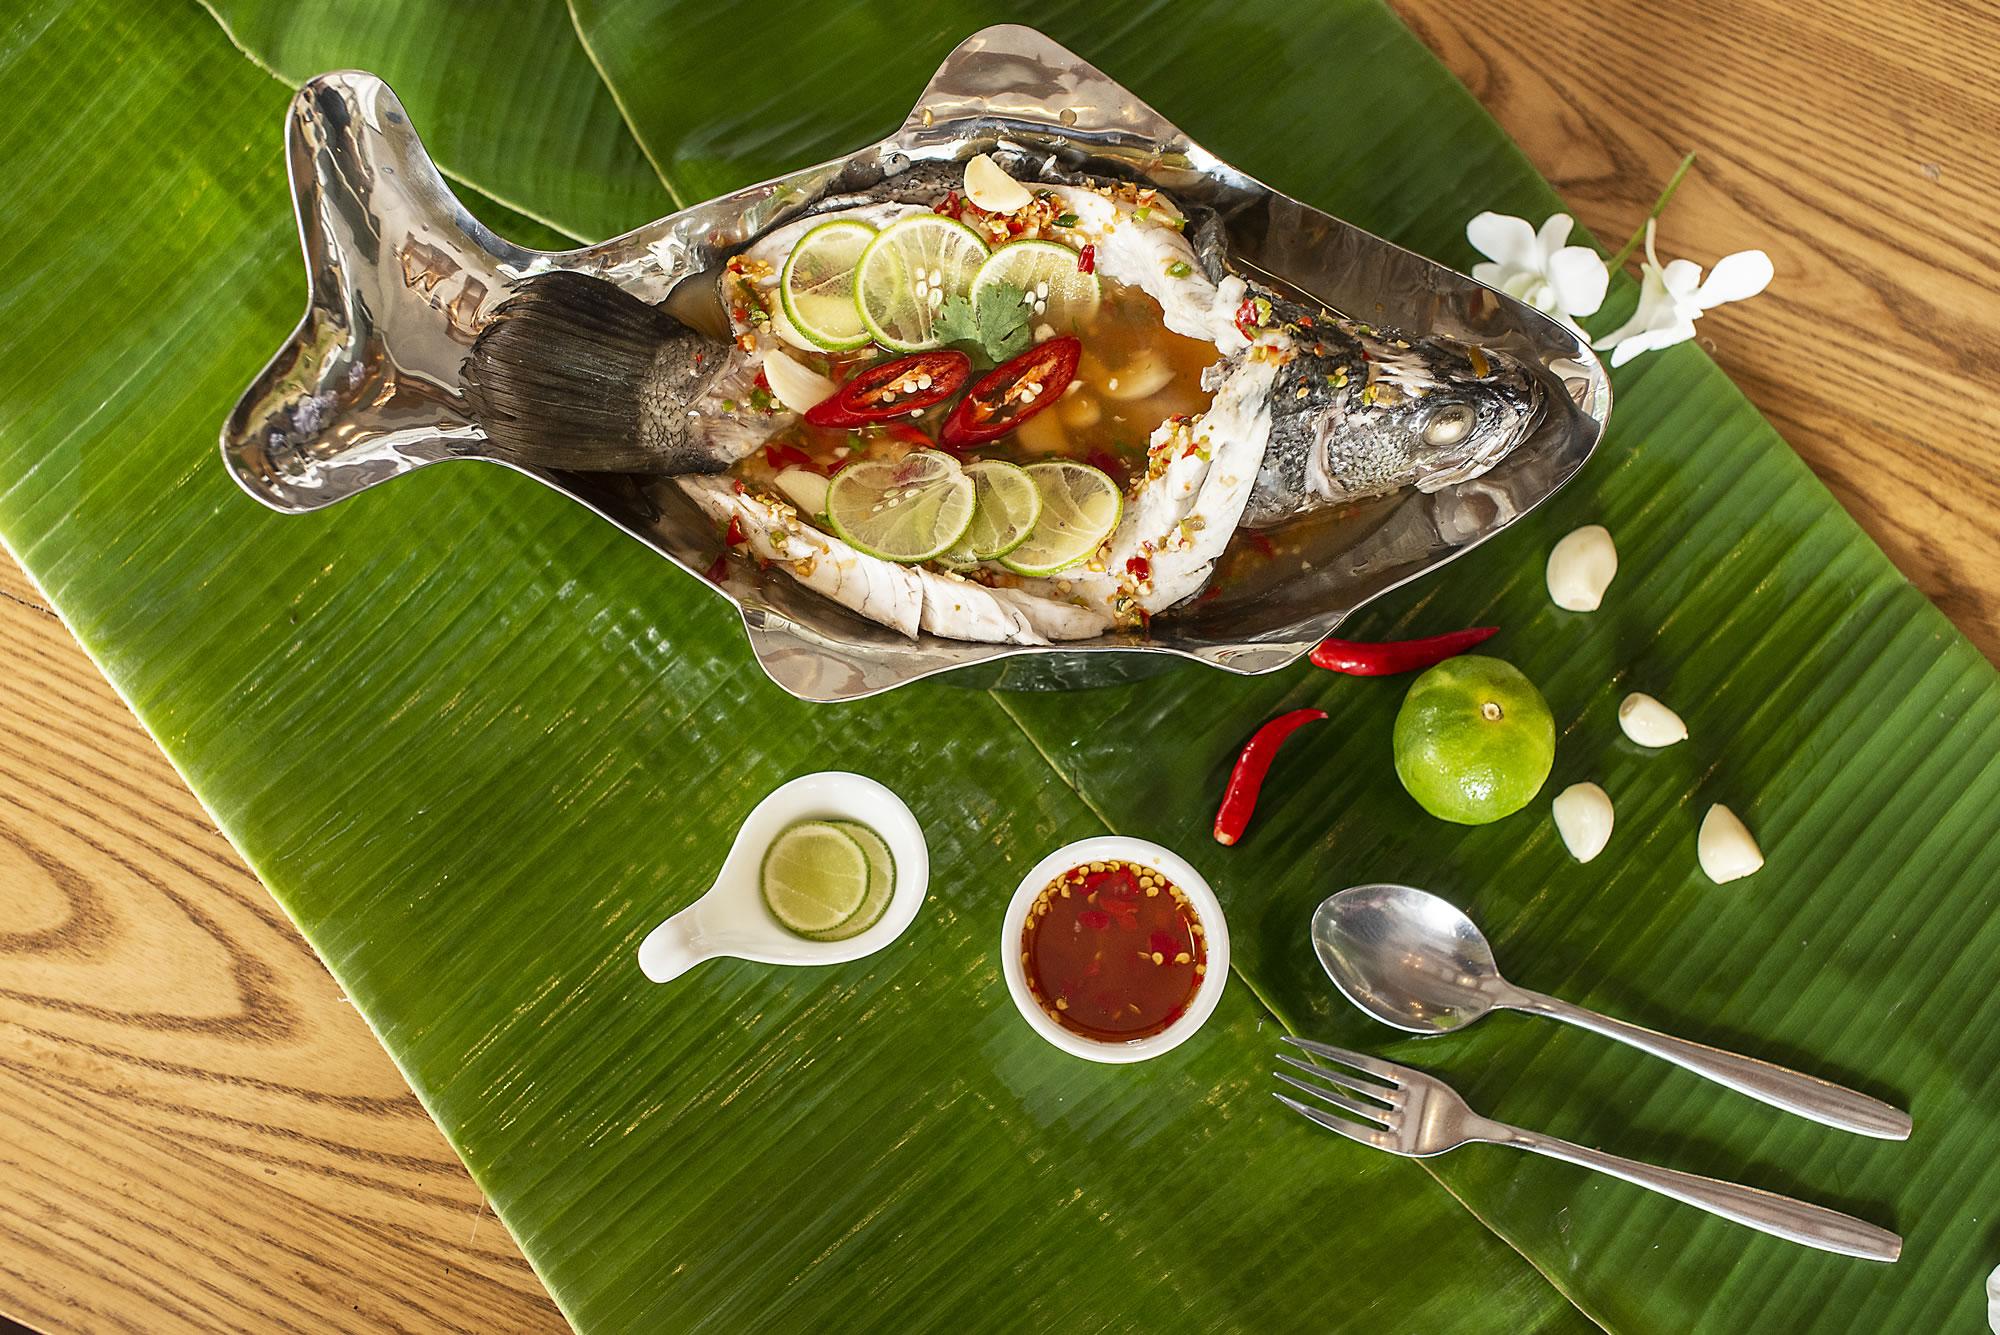 Baan-Thitiya-Thai-Pla-Neaung-Manow.jpg